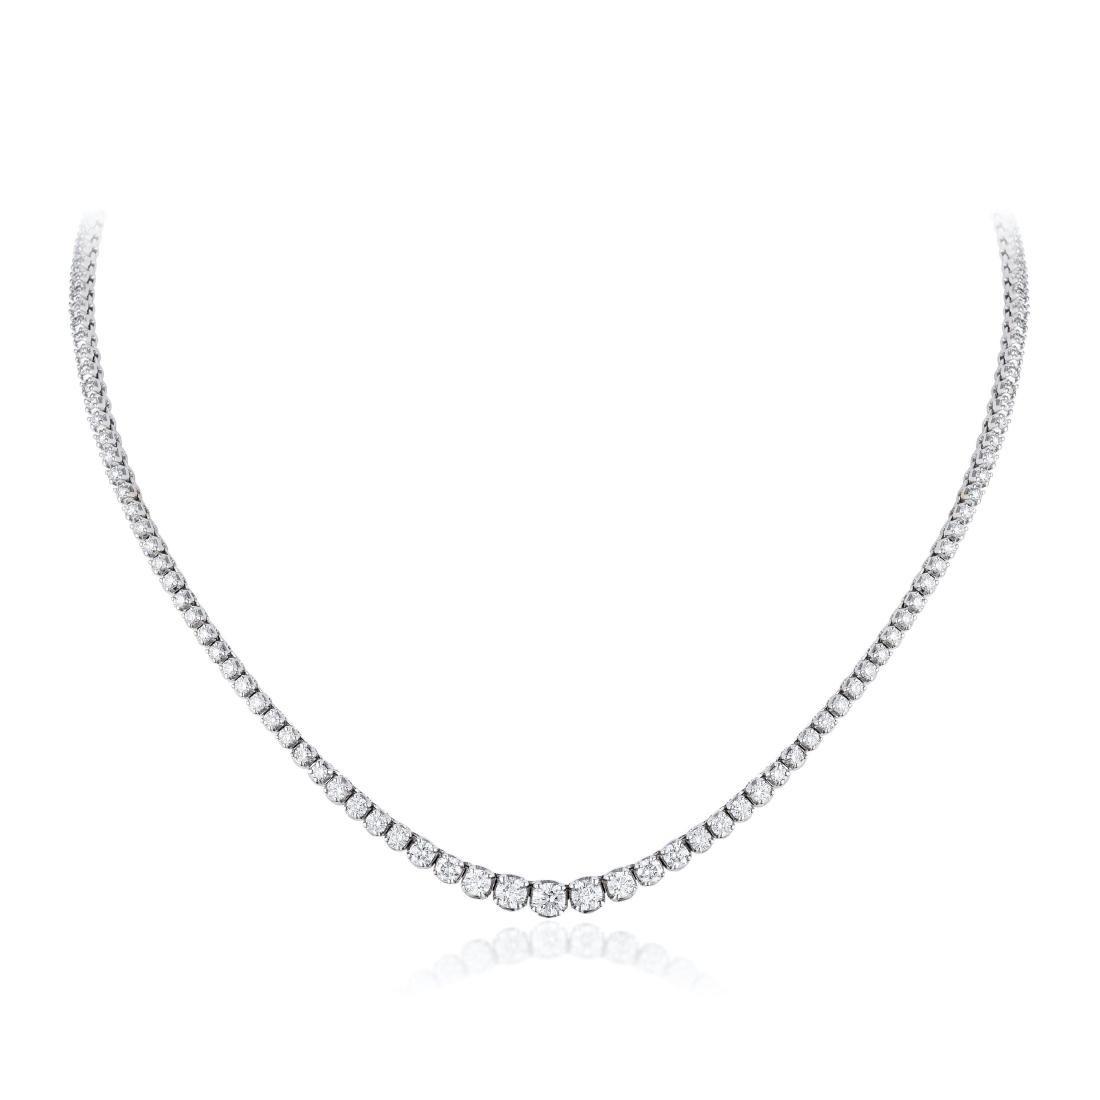 A Diamond Riviera Necklace